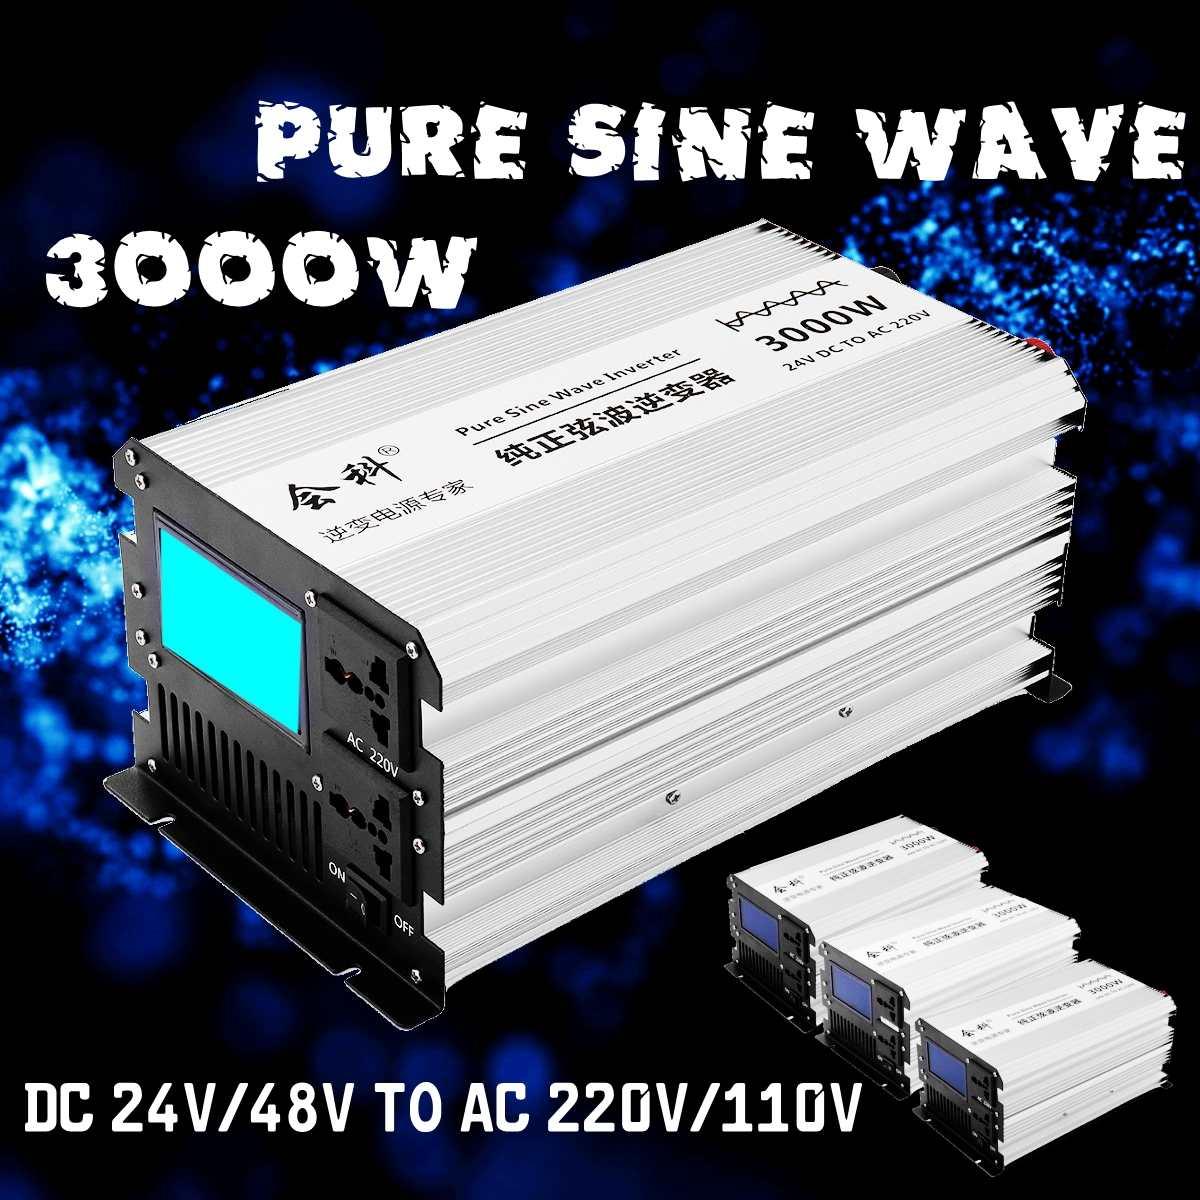 Onduleur onde sinusoïdale pure 1500 W 3000 W pics 12 v/24 v/48 v à AC110v/220 v LCD affichage onduleur alimentation